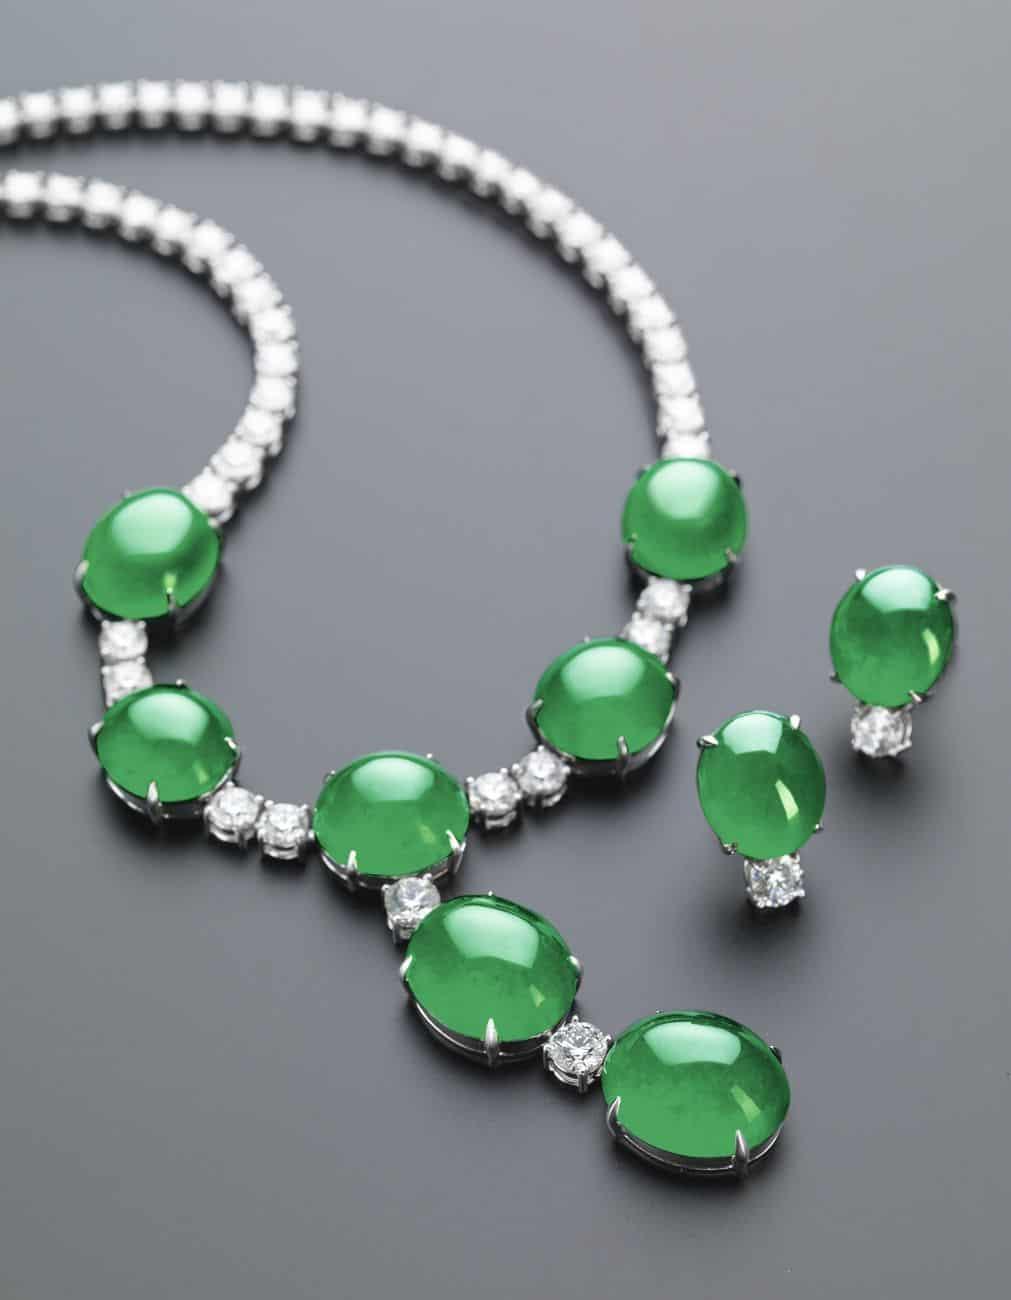 Lot 1779 - Important Jadeite and Diamond Demi-Parure